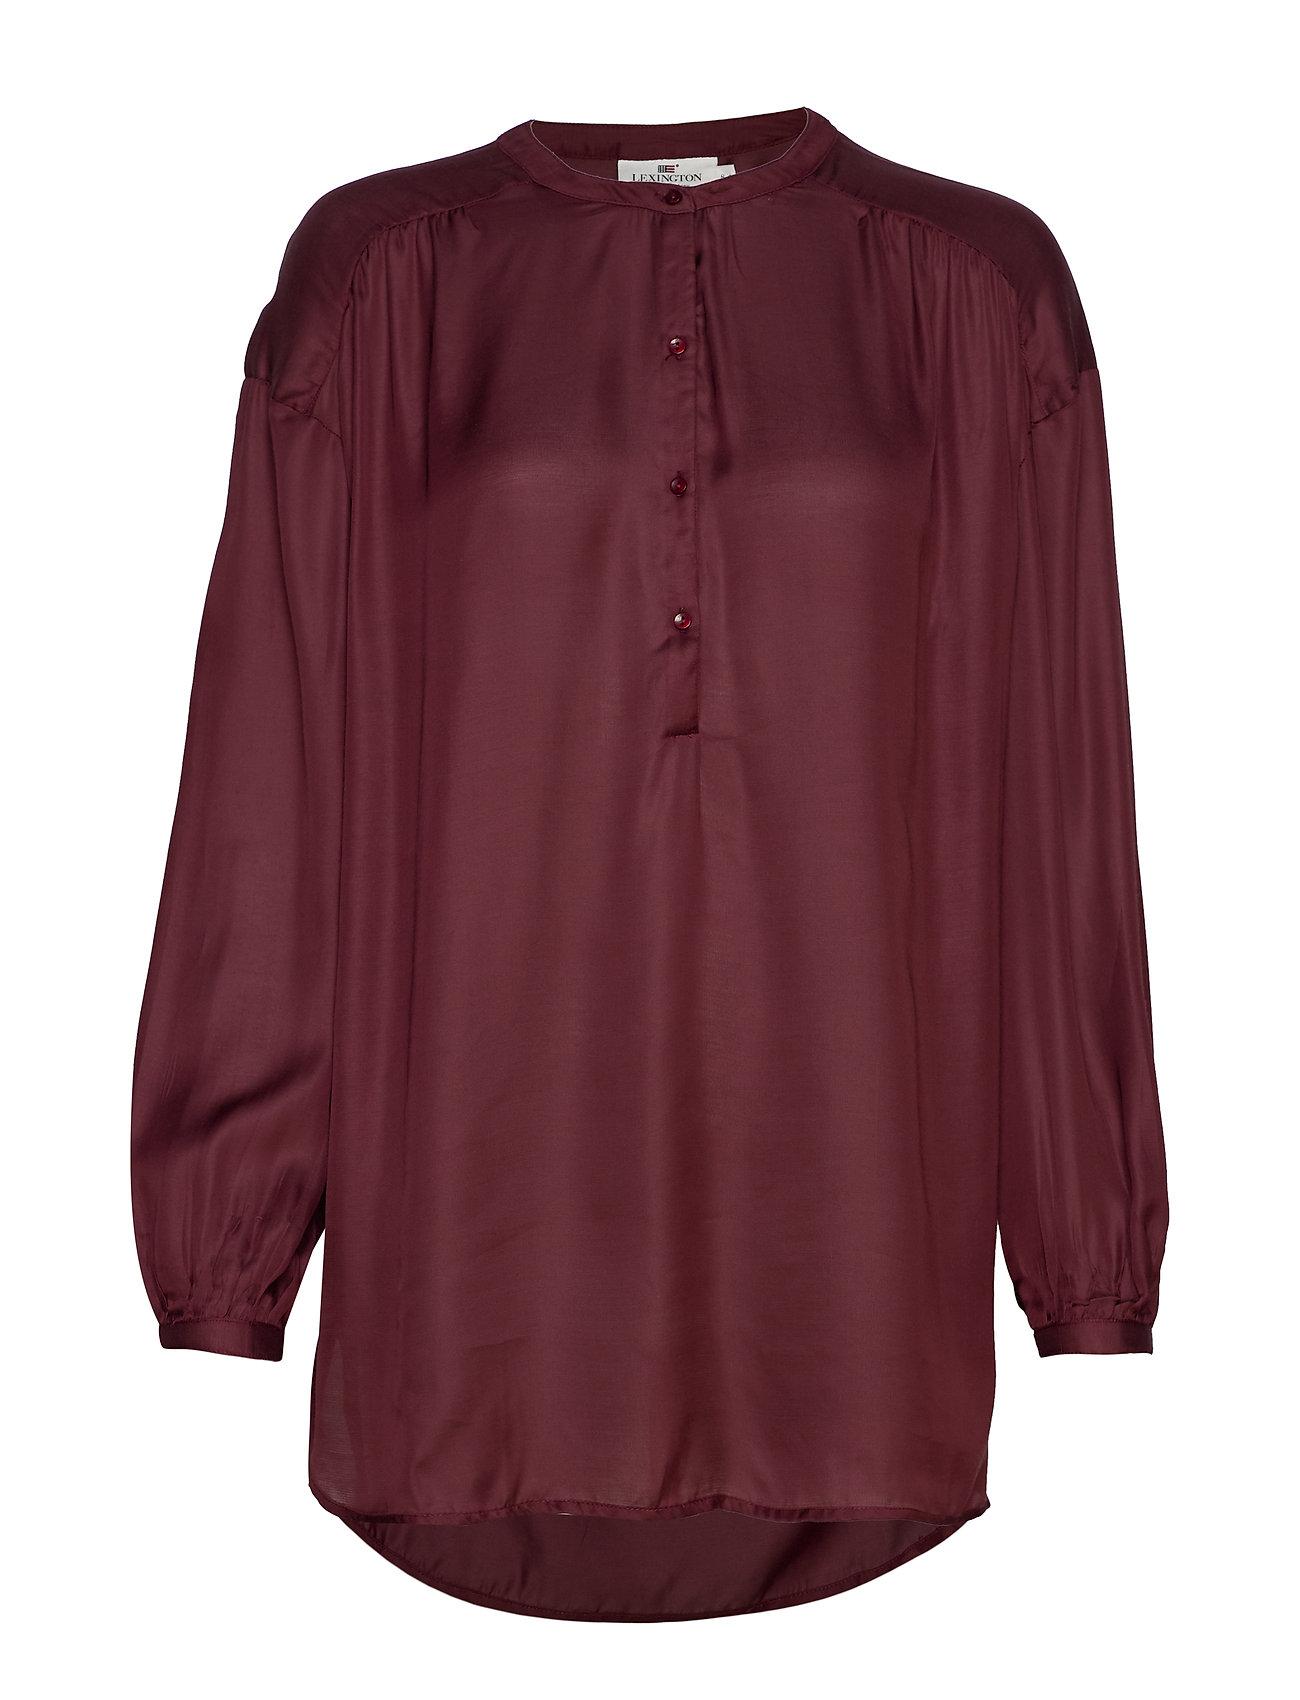 Lexington Clothing Nellie Satin Blouse - DARK RED